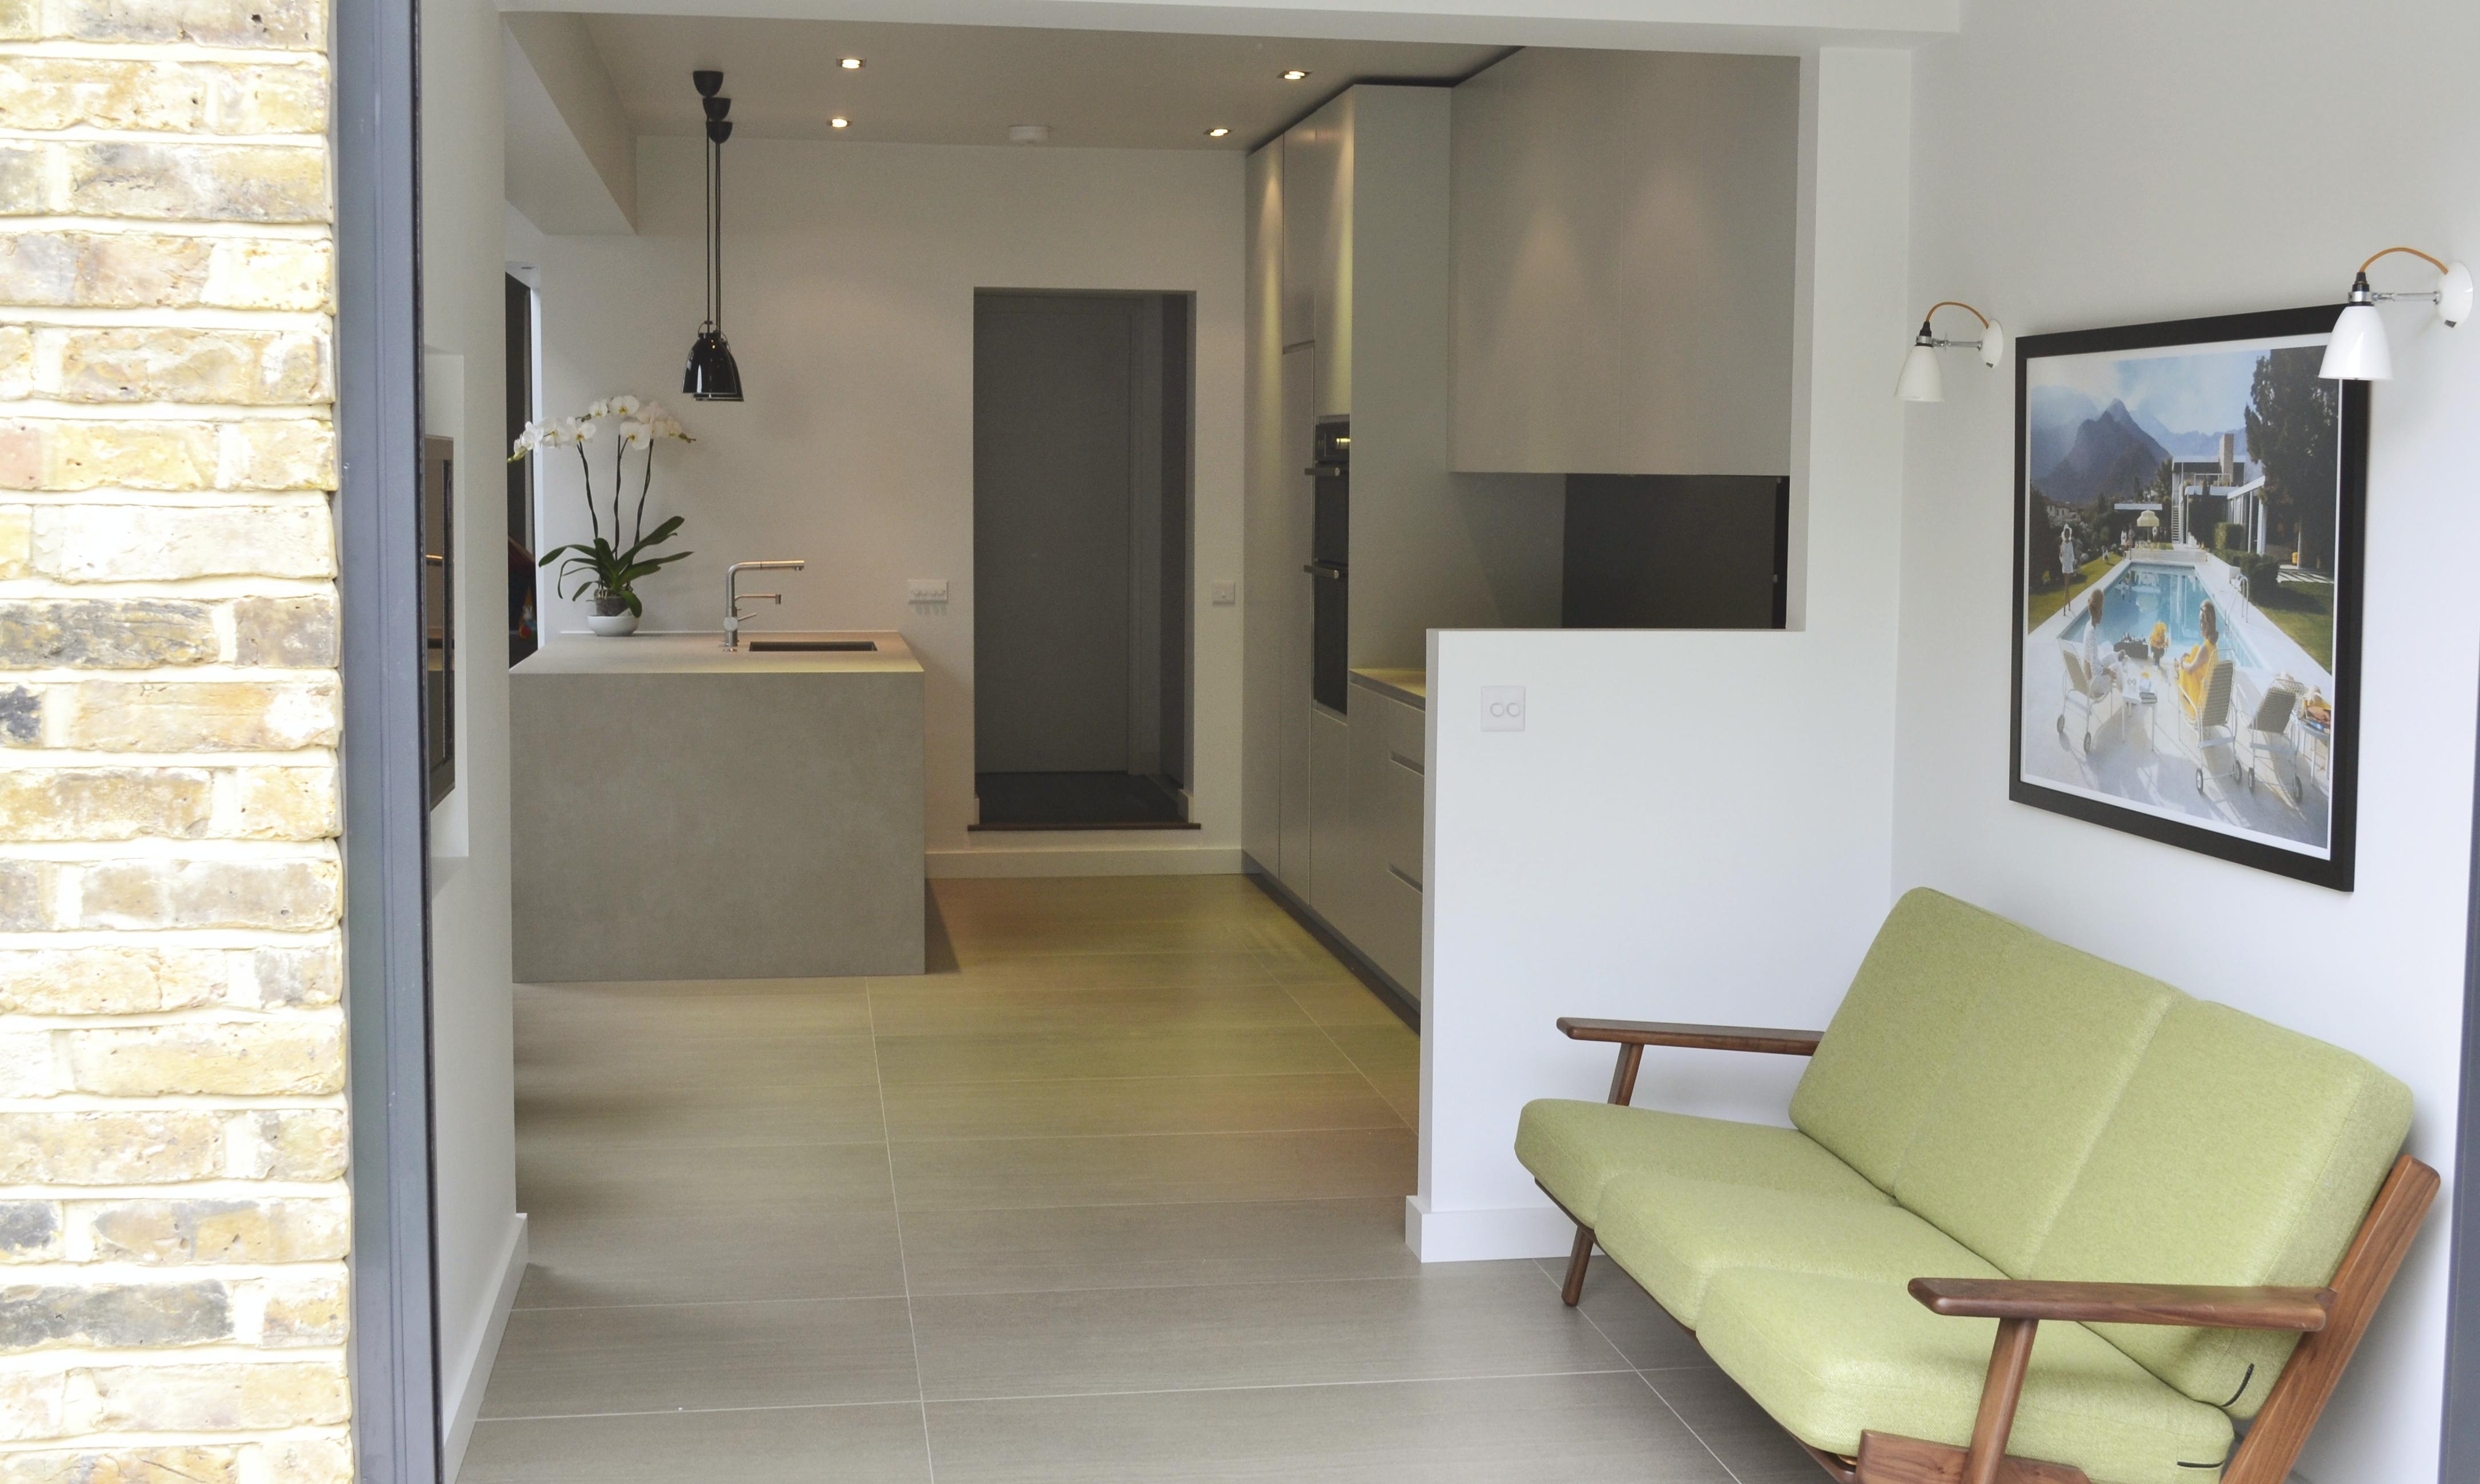 Green sofa in a contemporary white kitchen